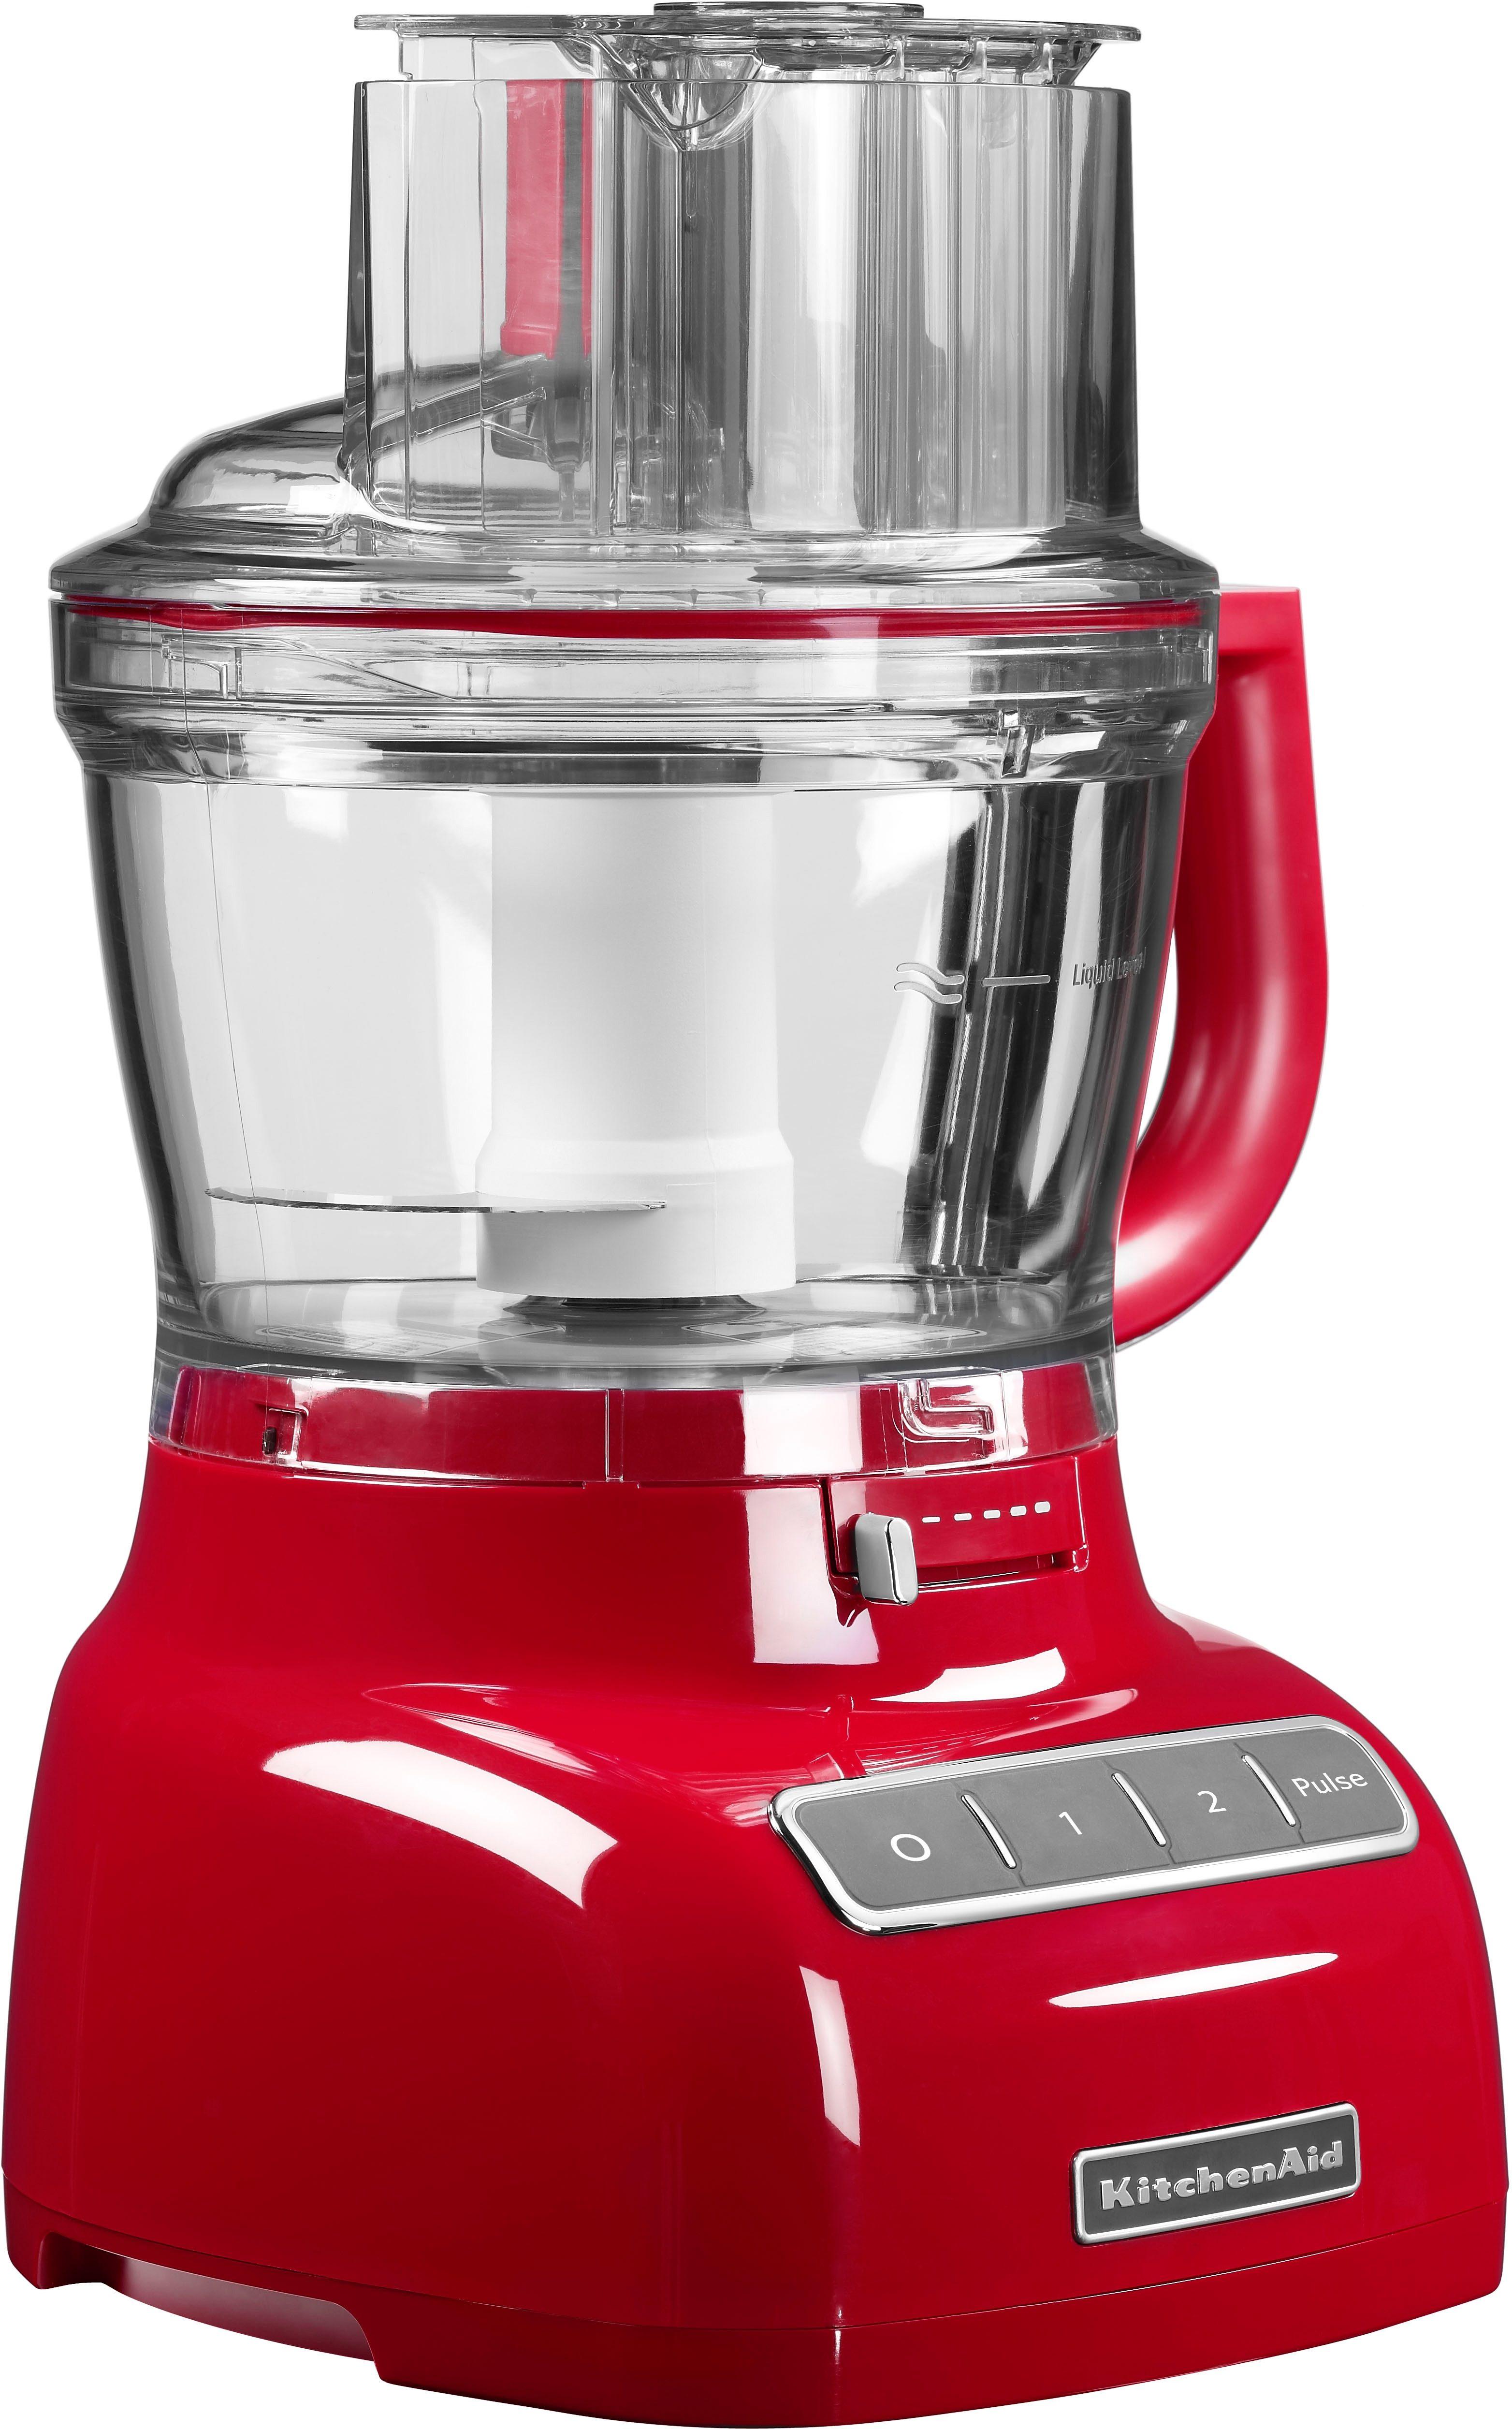 KitchenAid Kompakt-Küchenmaschine 5KFP1335EER, 300 W, 300 Watt